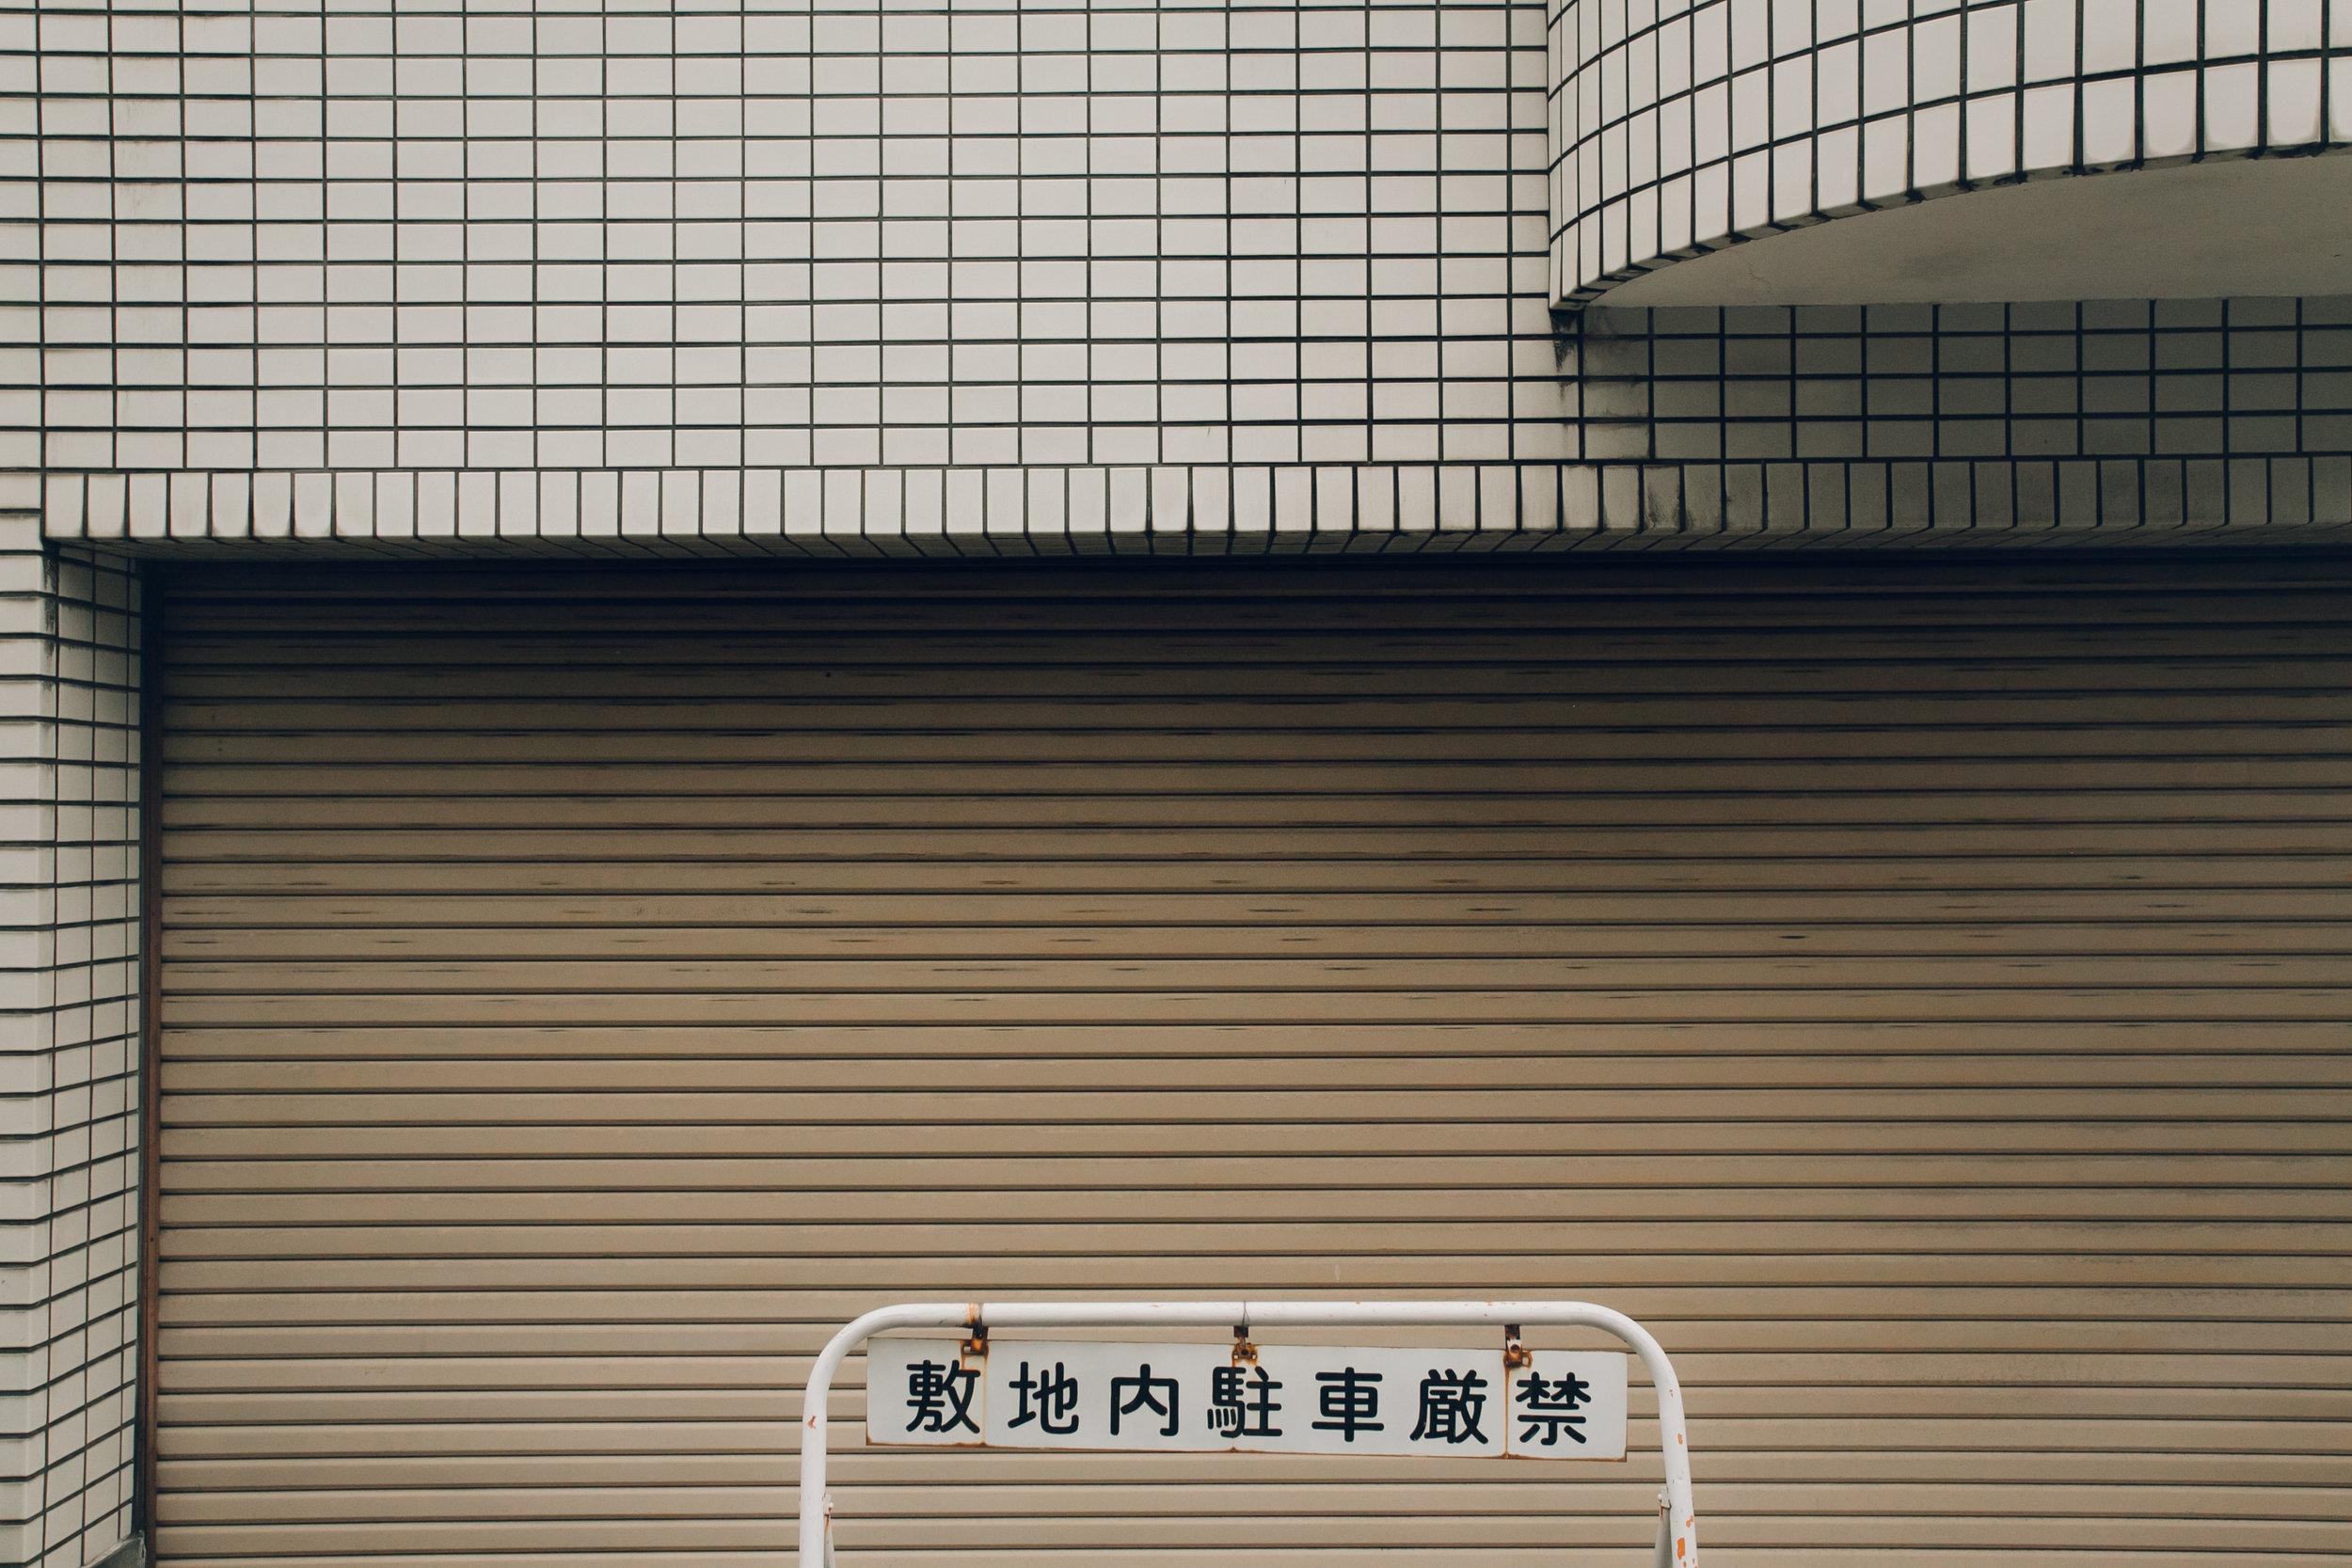 Haarkon in Japan. Tokyo notes.